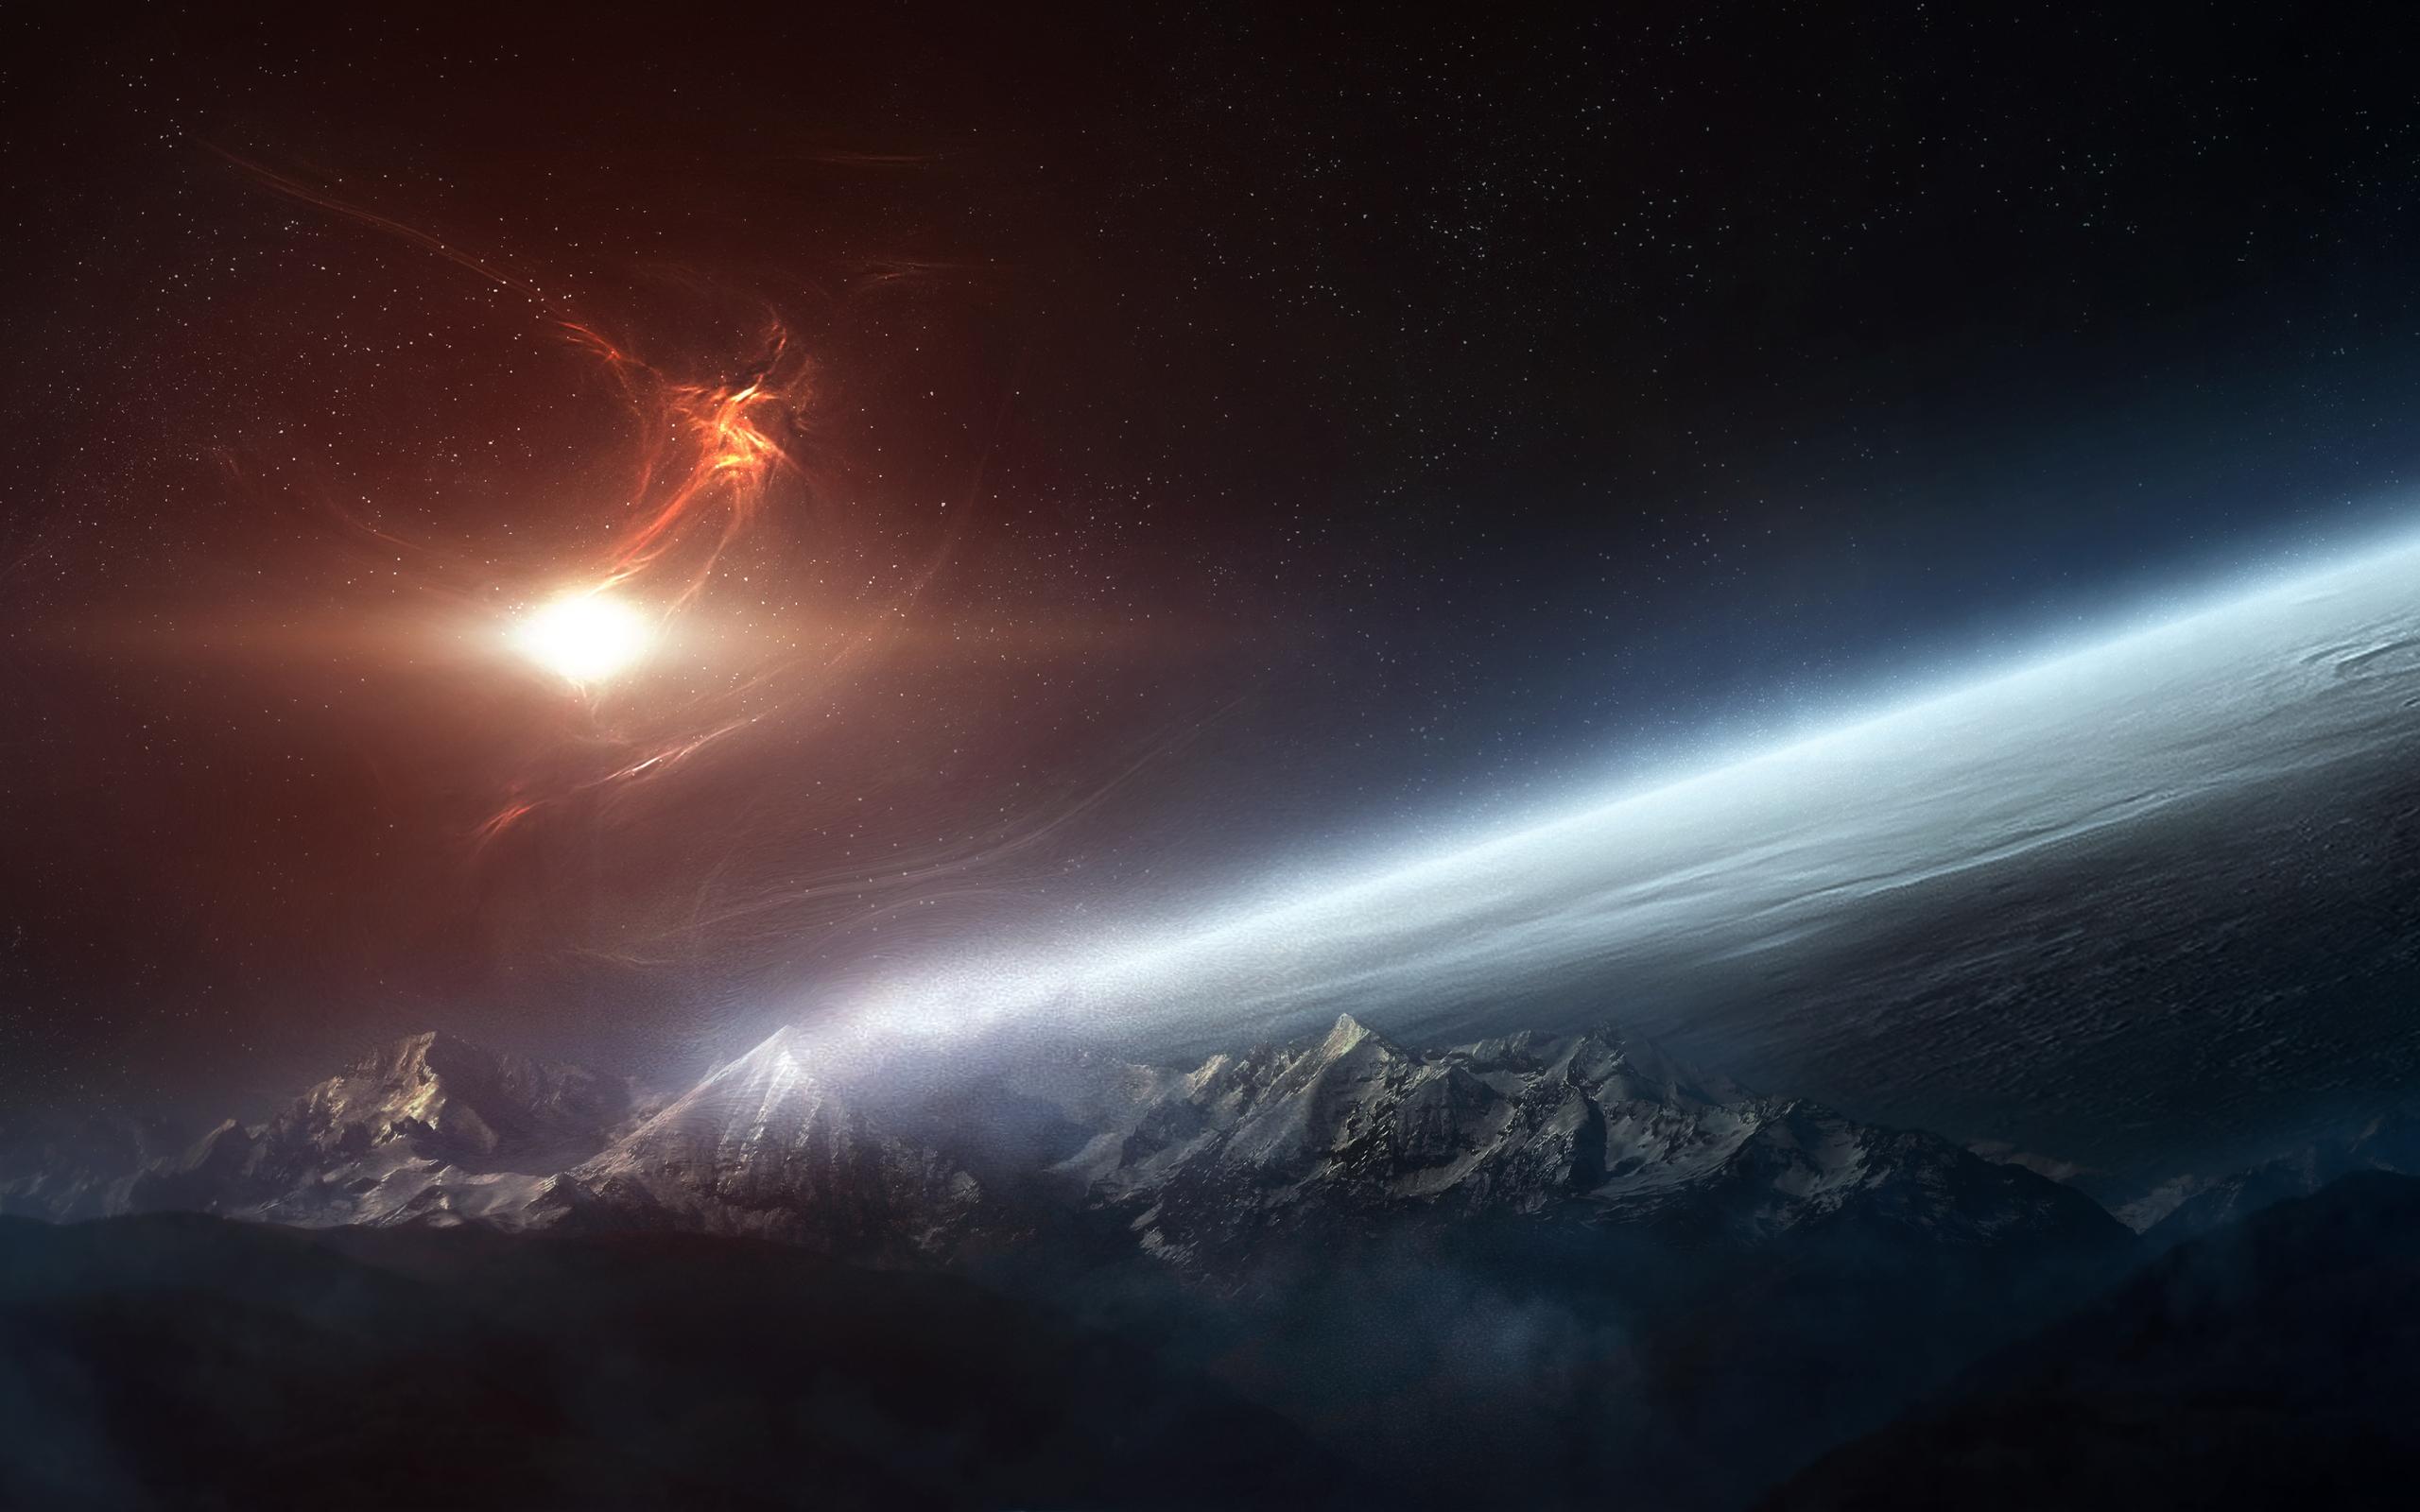 Sci Fi Landscape 2560x1600